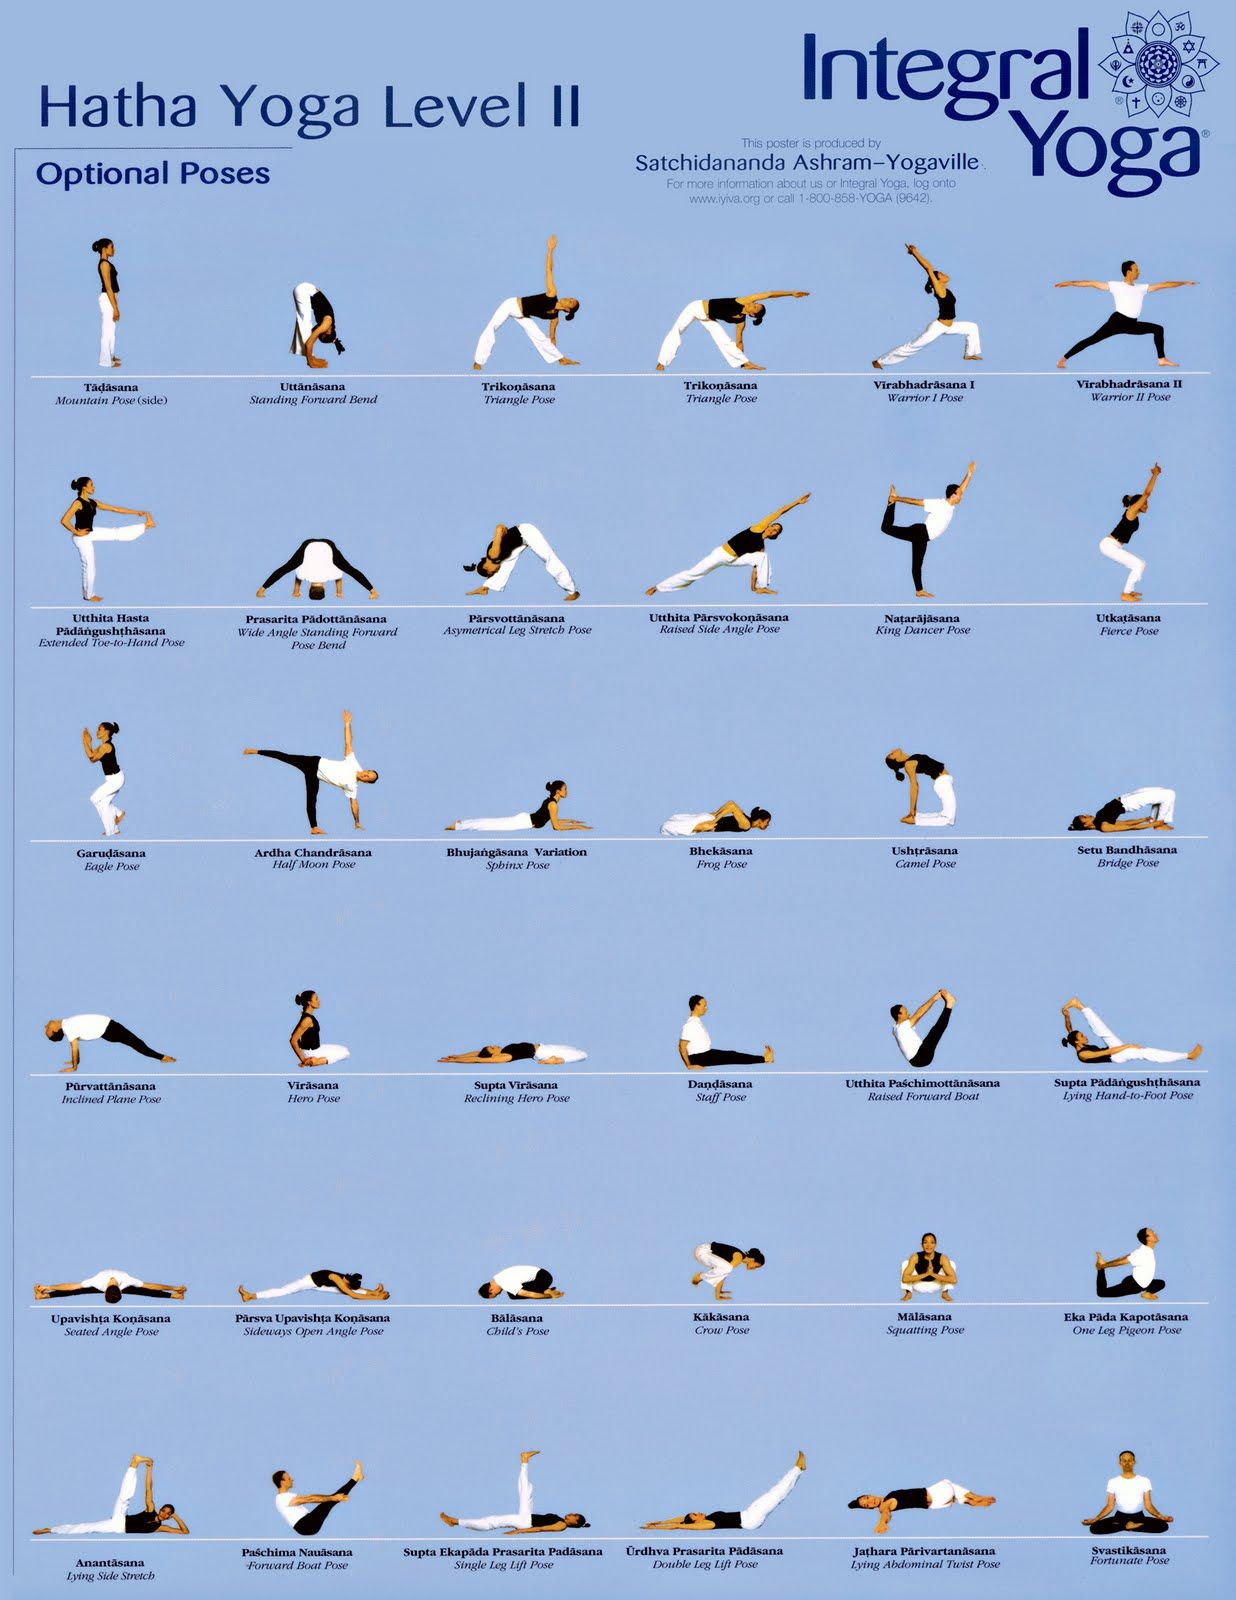 Hatha Yoga Poses For Seniors